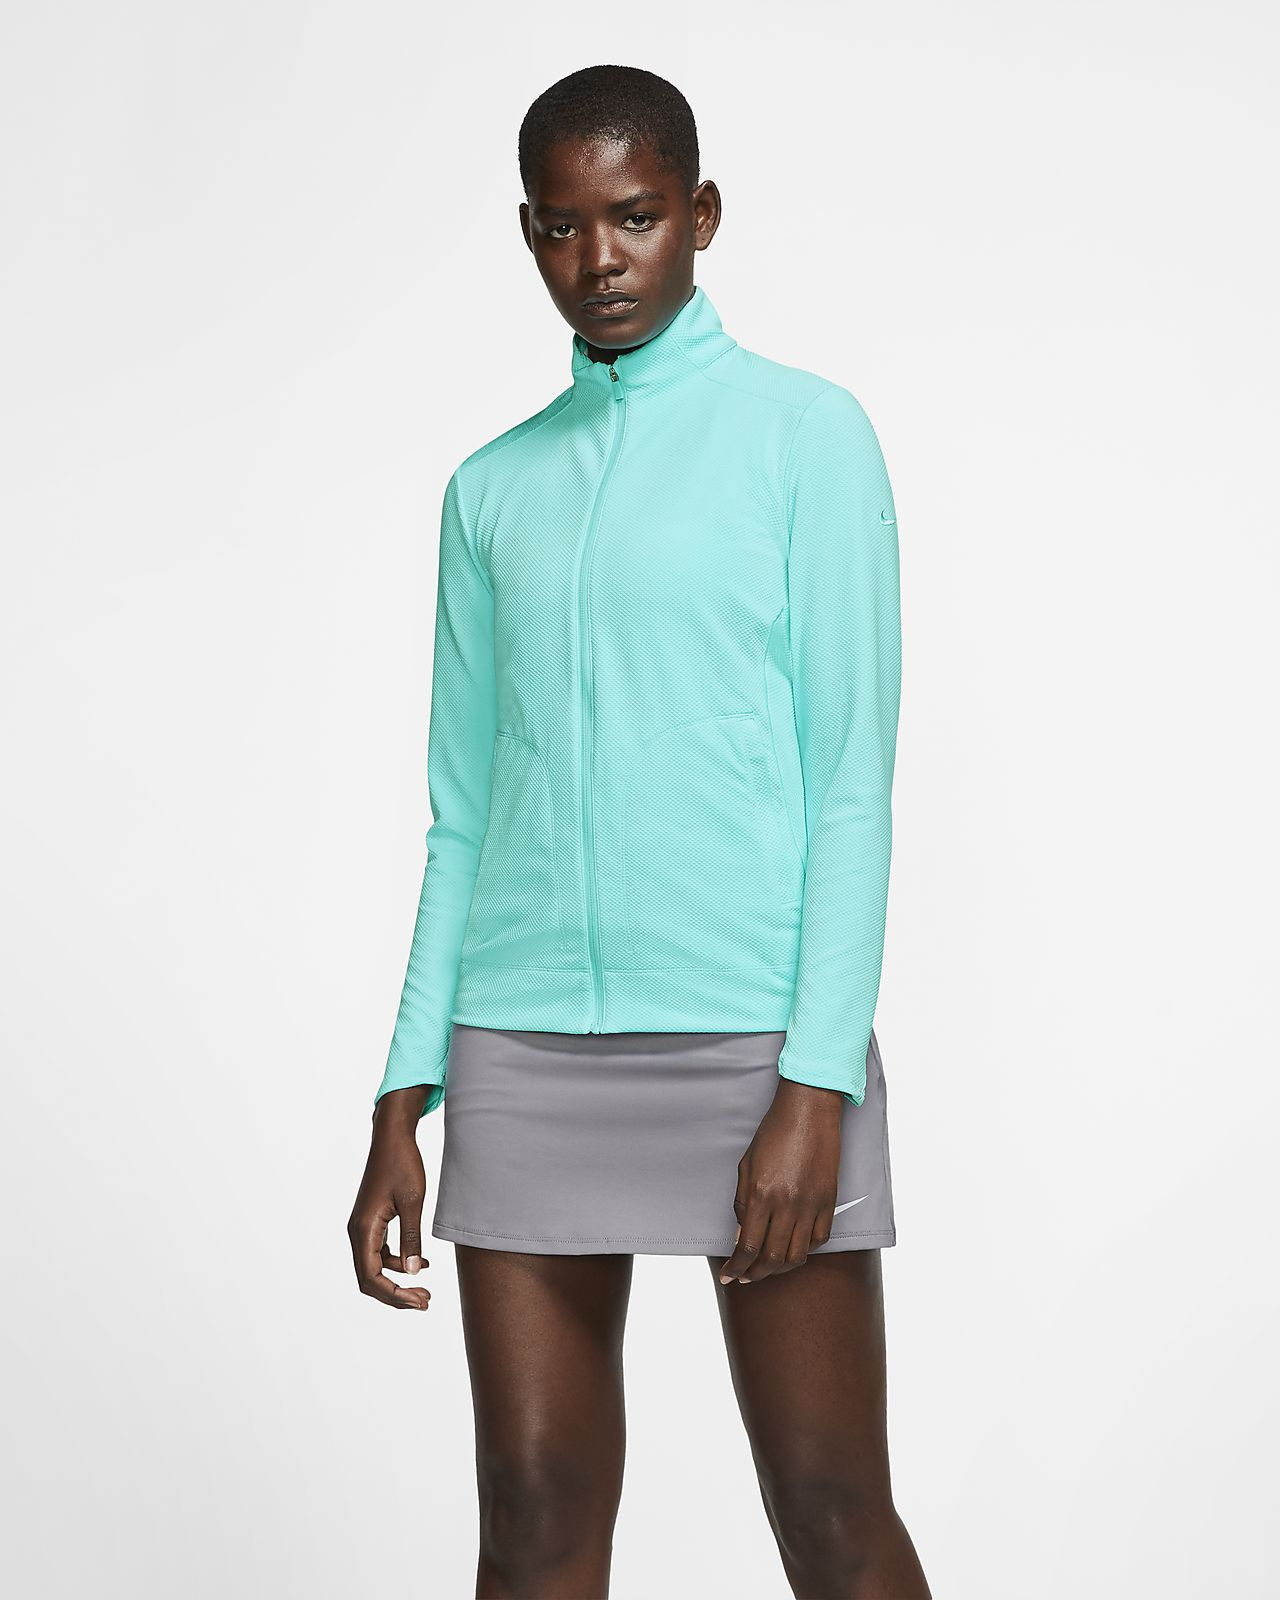 Dámská golfová bunda Nike Dri-FIT UV